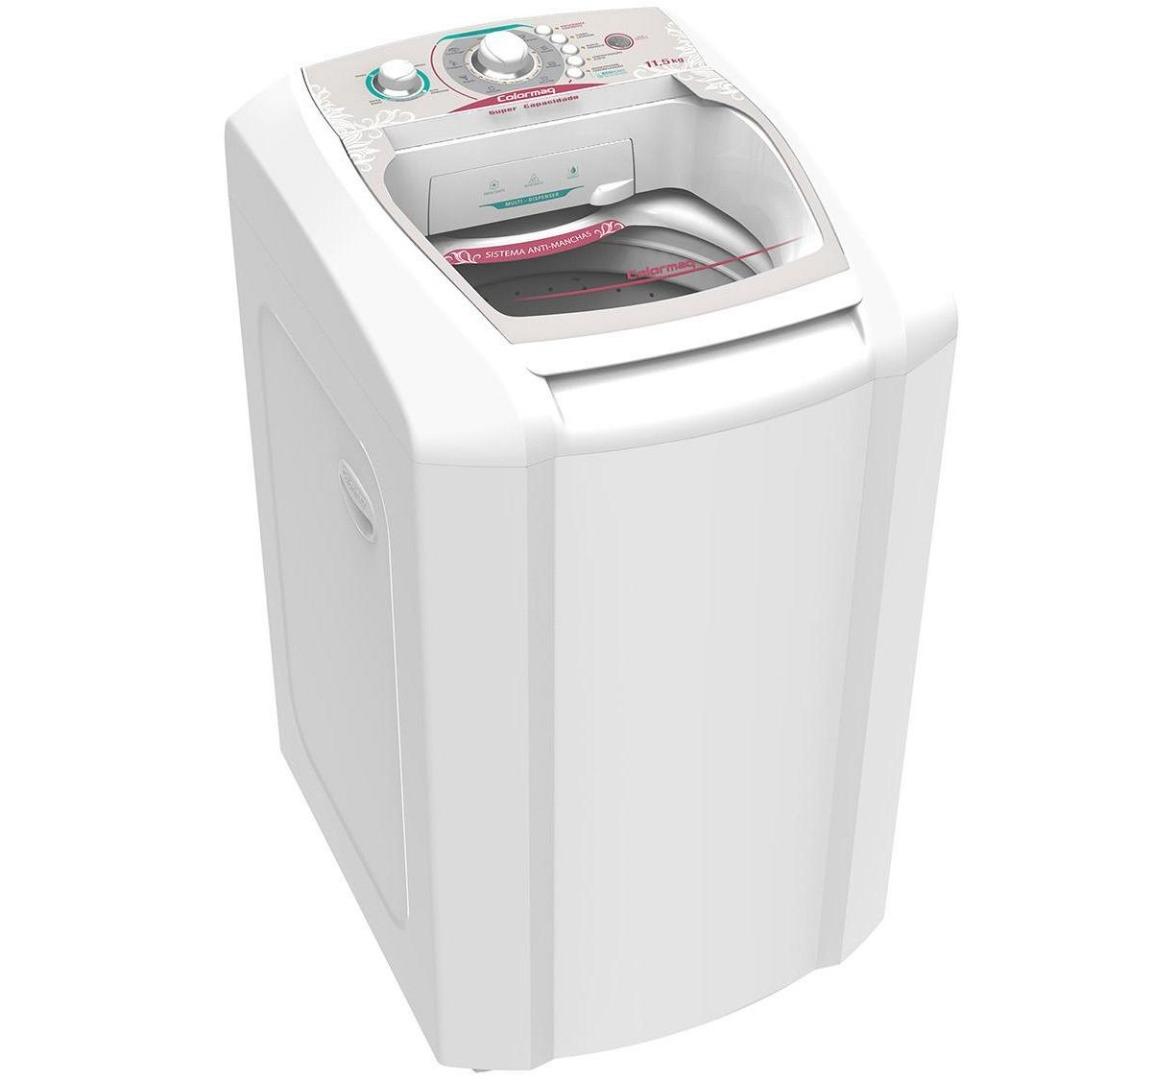 Lavadora de Roupas 11,5 Kg LCA12 com Filtro de Fiapos Branca - Colormaq